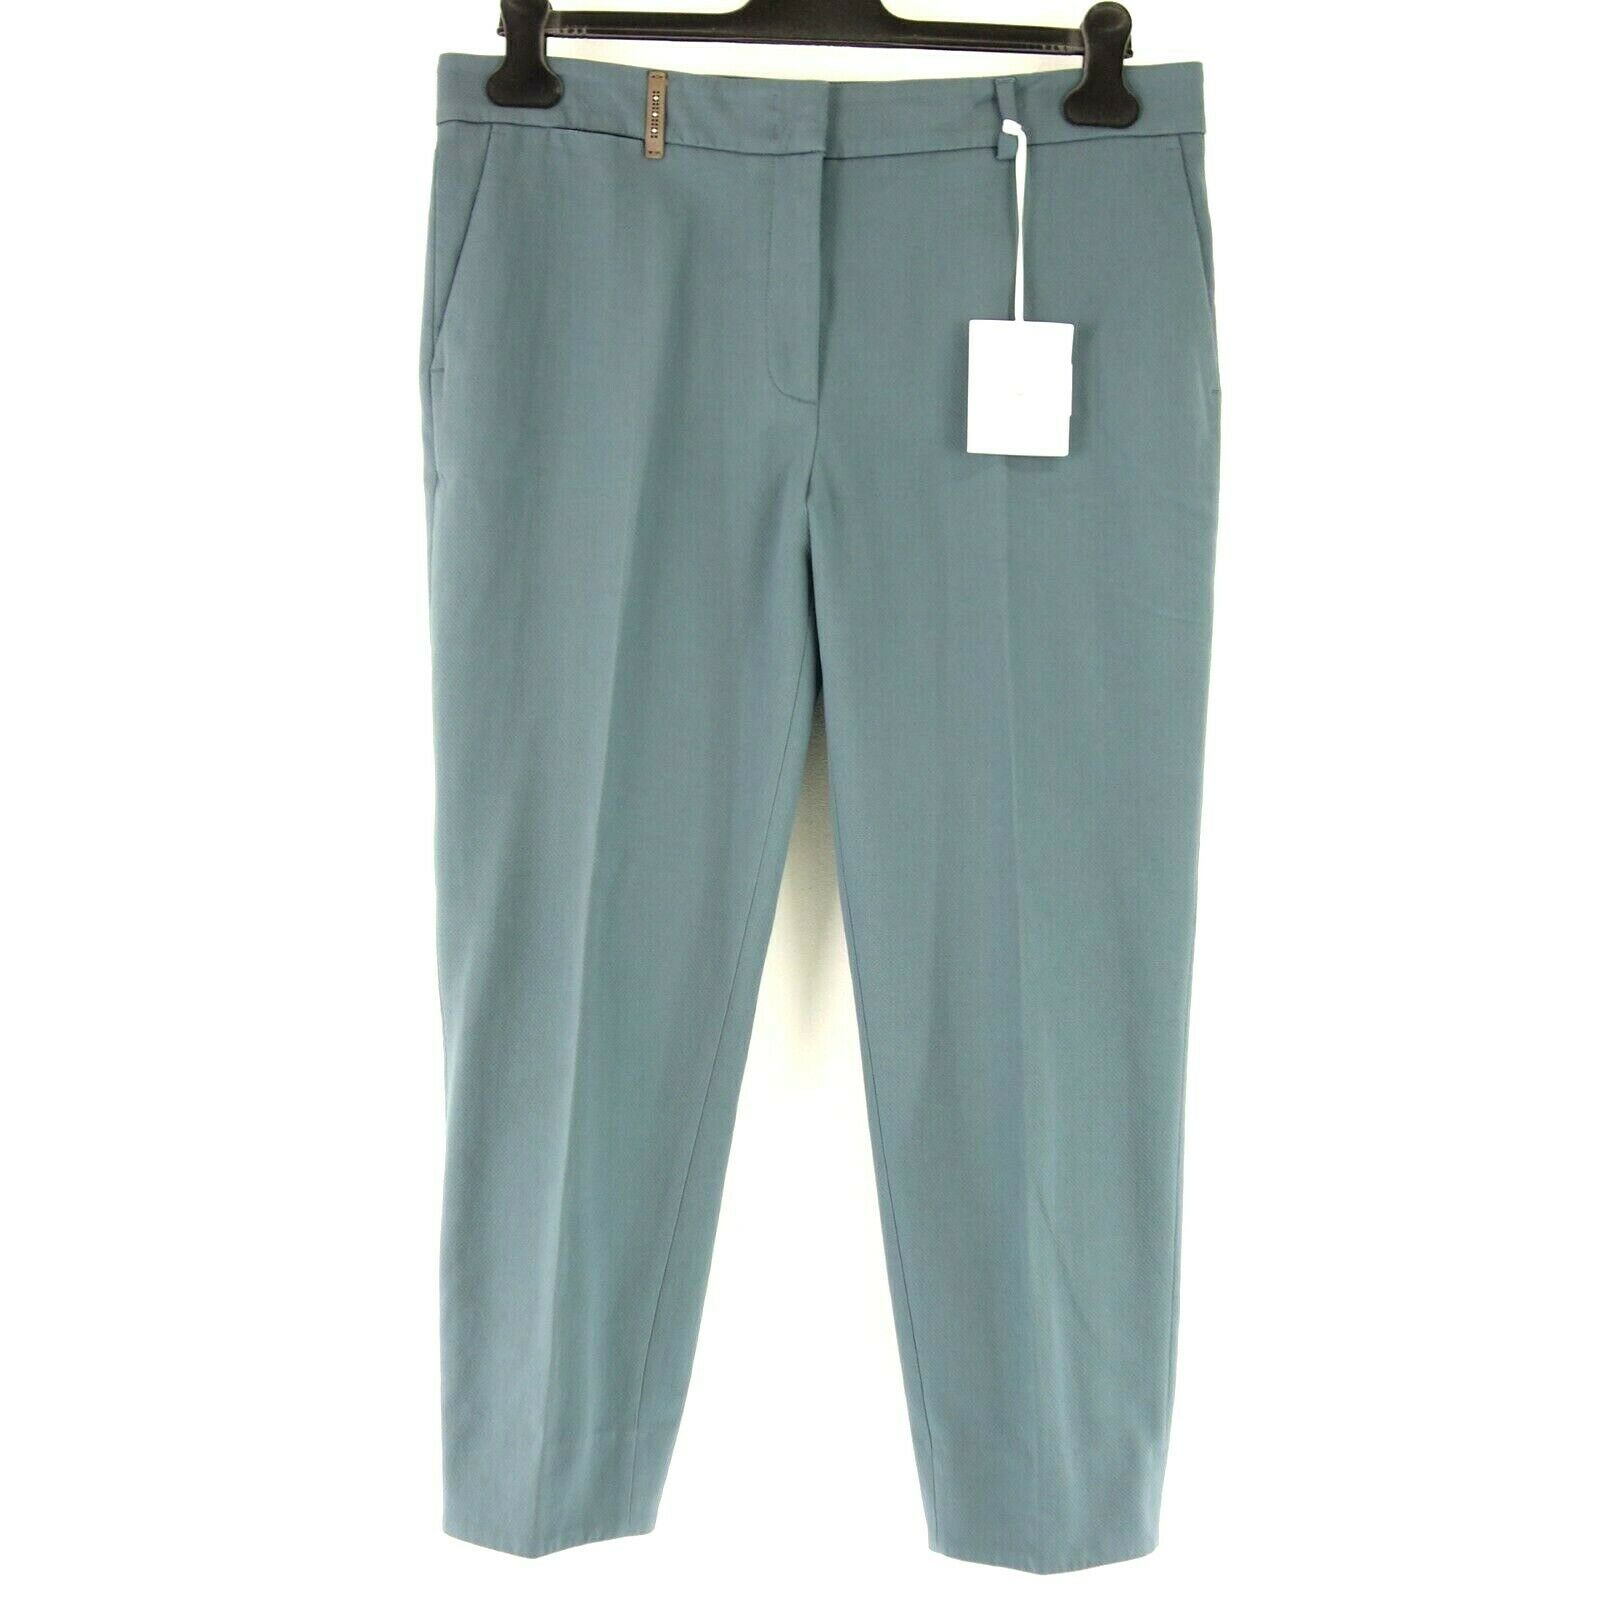 Peserico Women Pants P04969 It 48 de 42 Straight Cotton Spandex Np 279 New